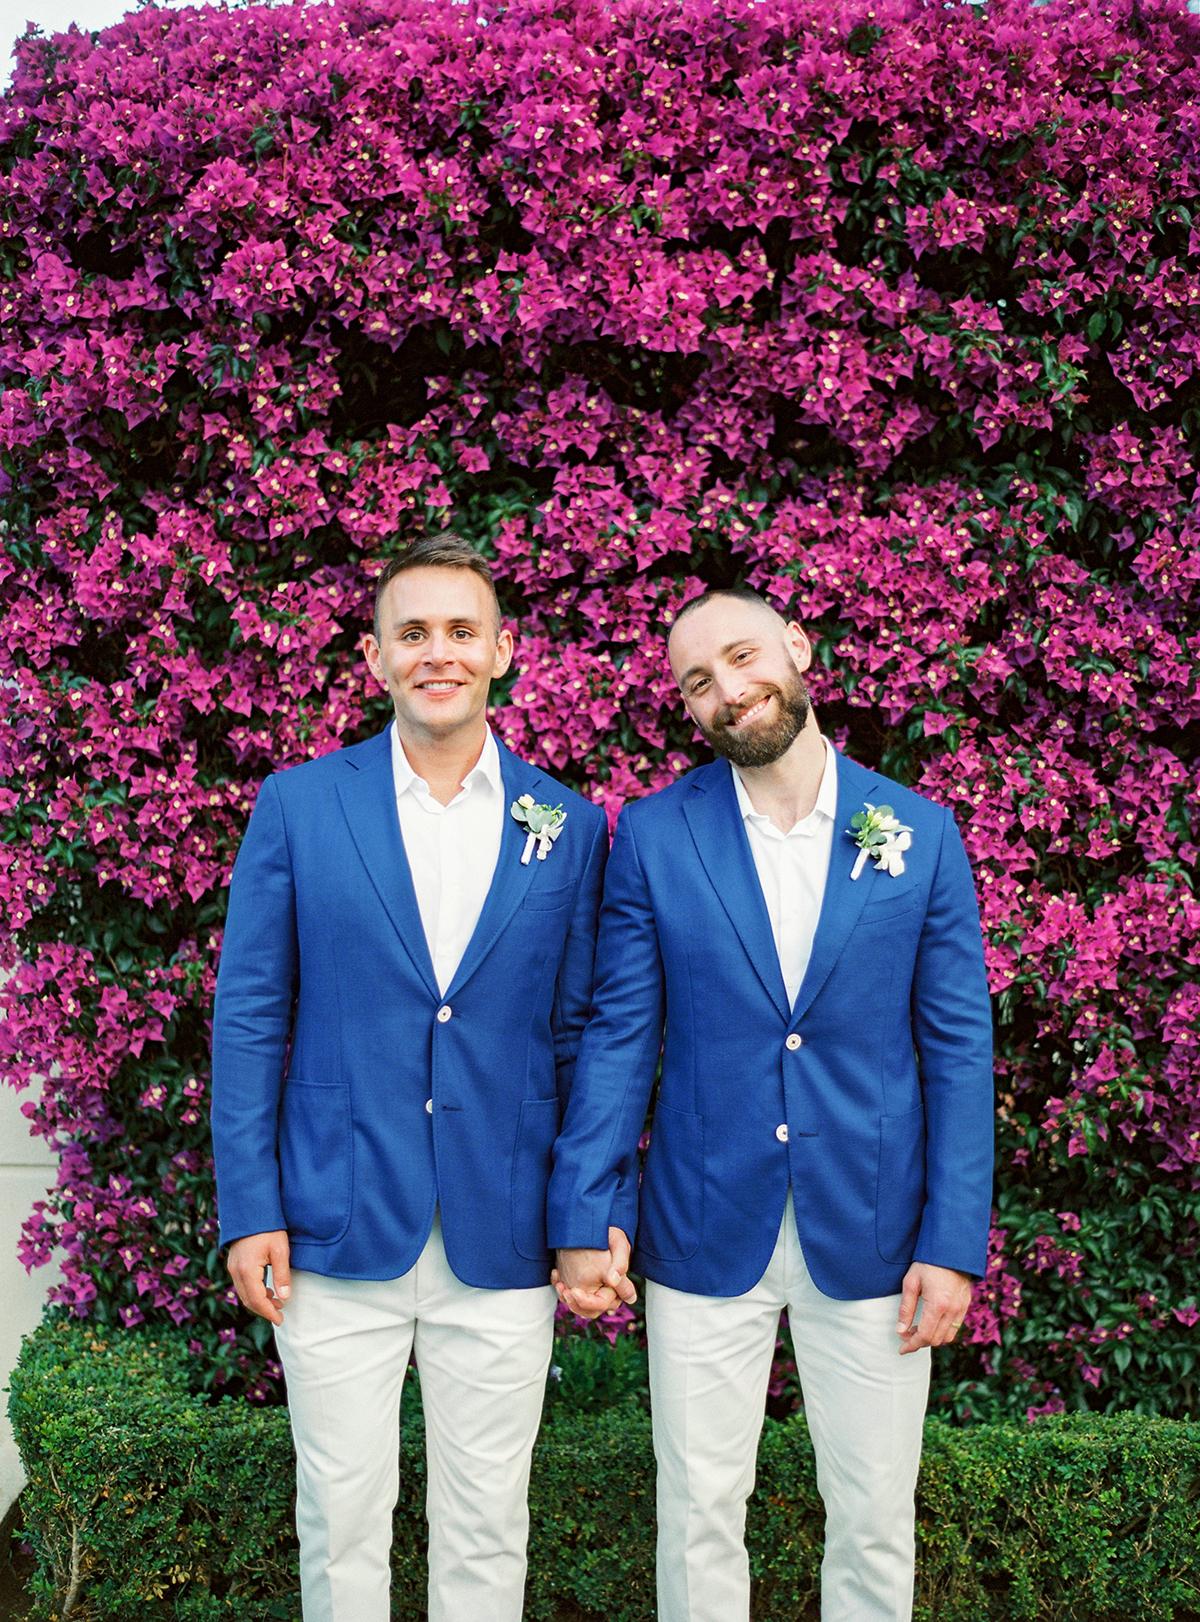 Grand-Hôtel du Cap-Ferrat Wedding Photographer (30)